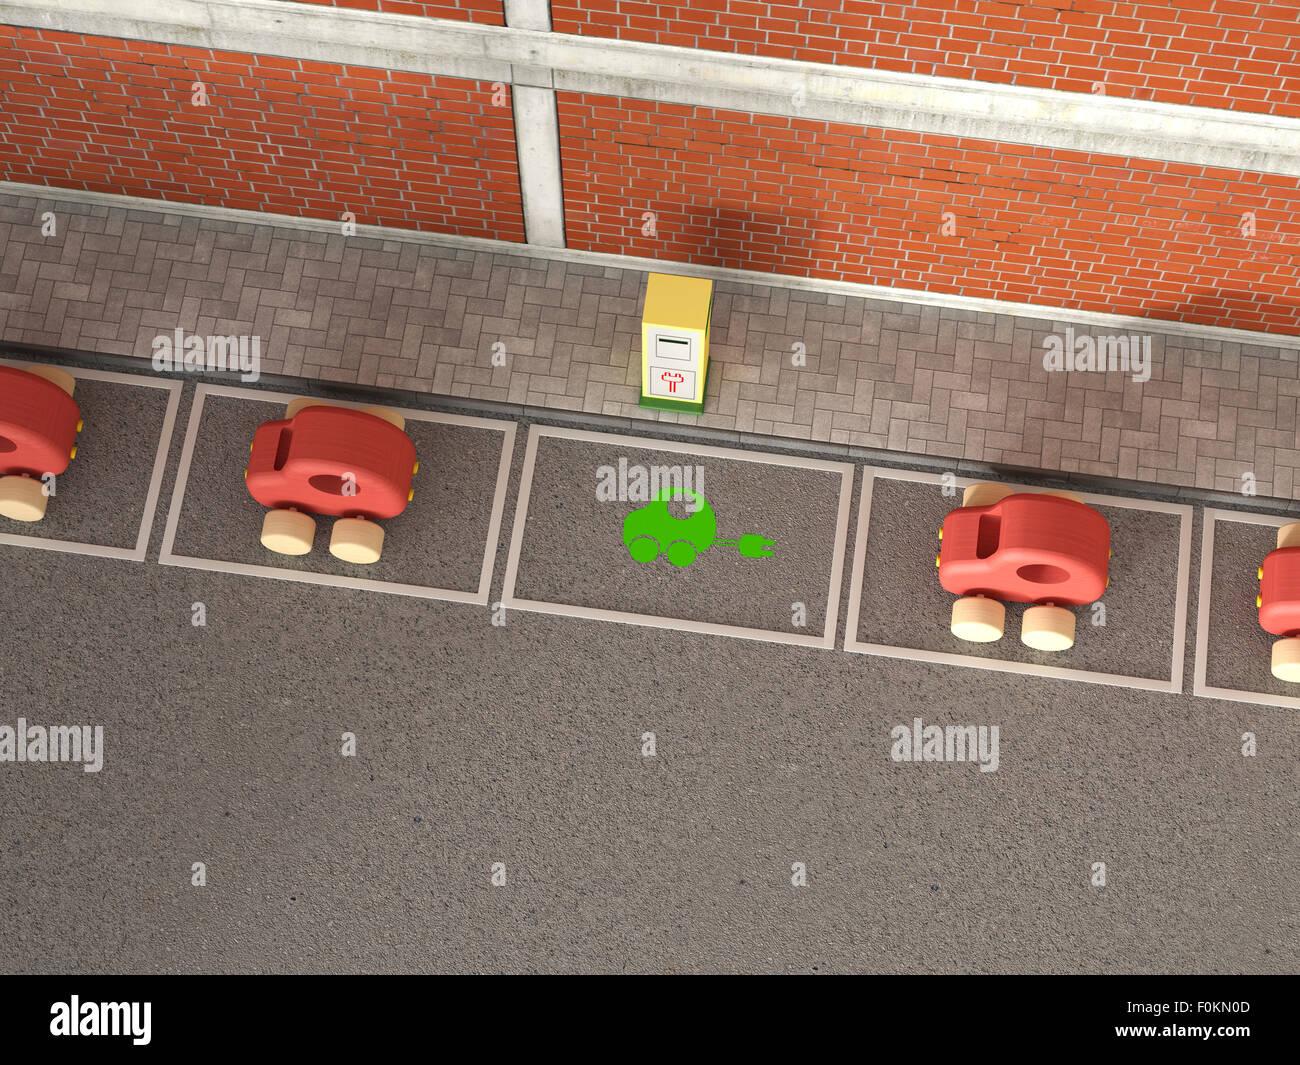 Electric Car Charging Symbol On Stockfotos & Electric Car Charging ...